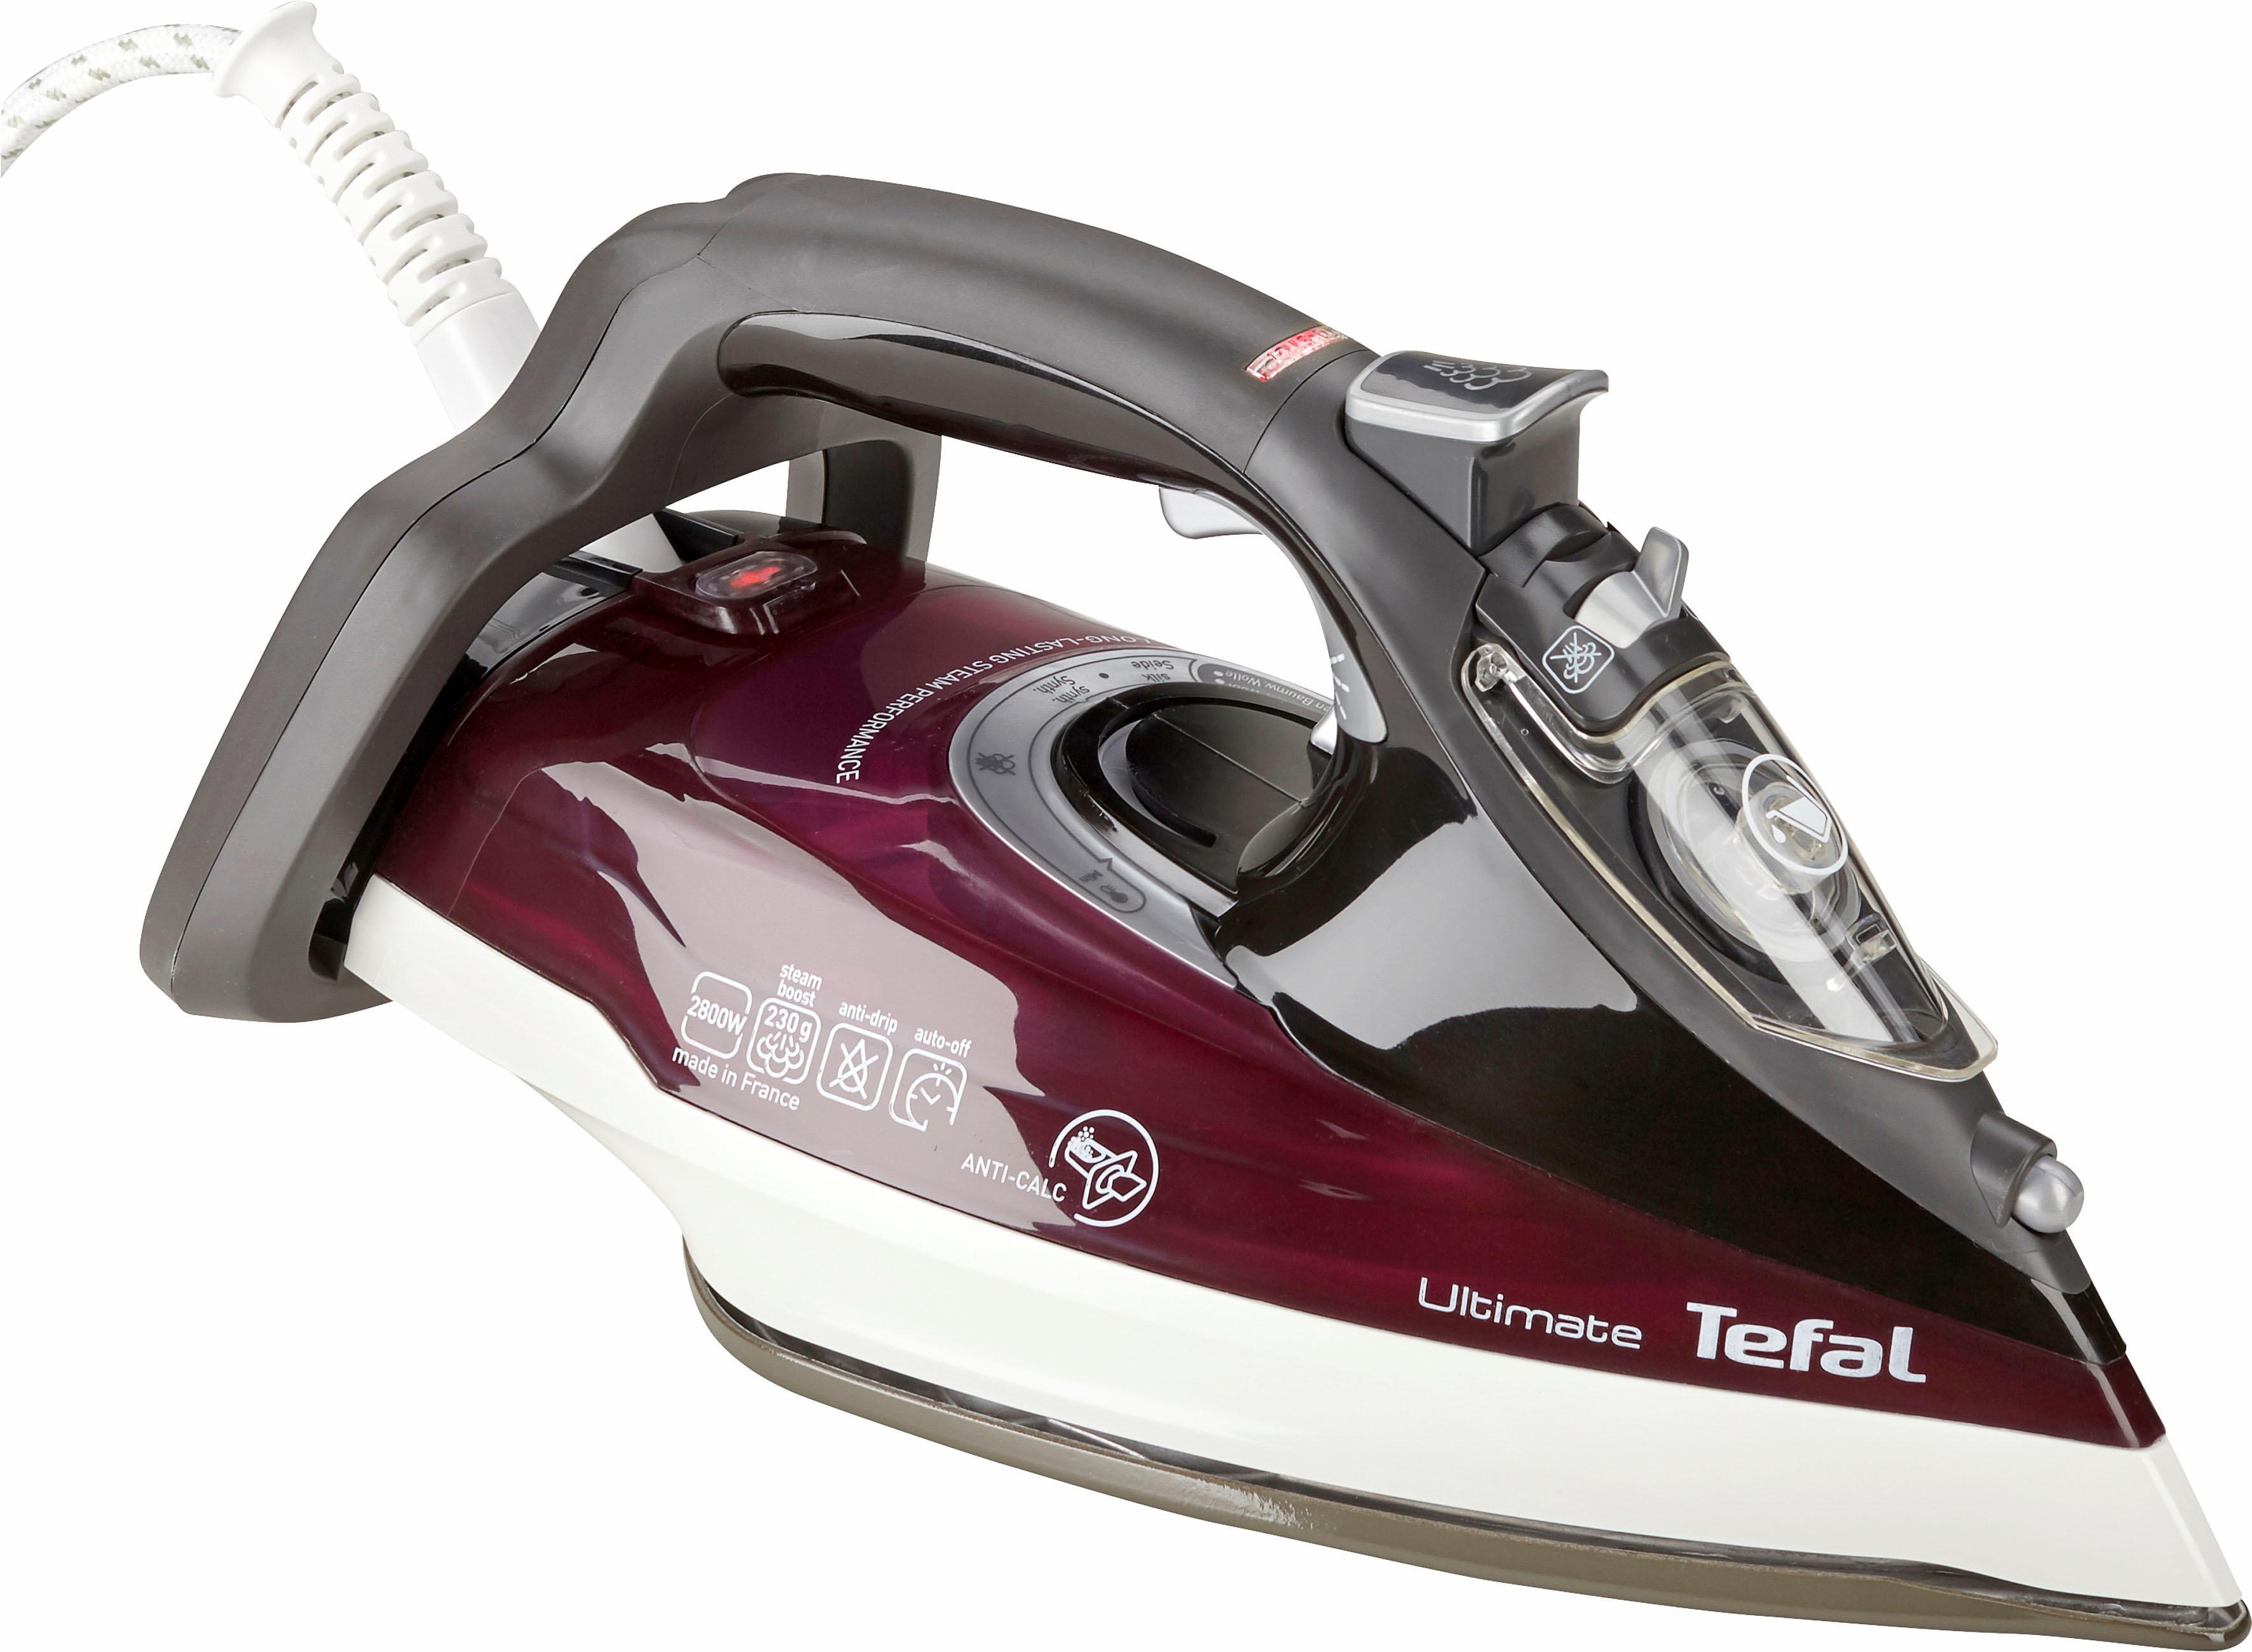 Tefal Dampfbügeleisen FV9740 Ultimate Anticalc, 2800 Watt | Flur & Diele > Haushaltsgeräte > Bügeleisen | Lila | TEFAL